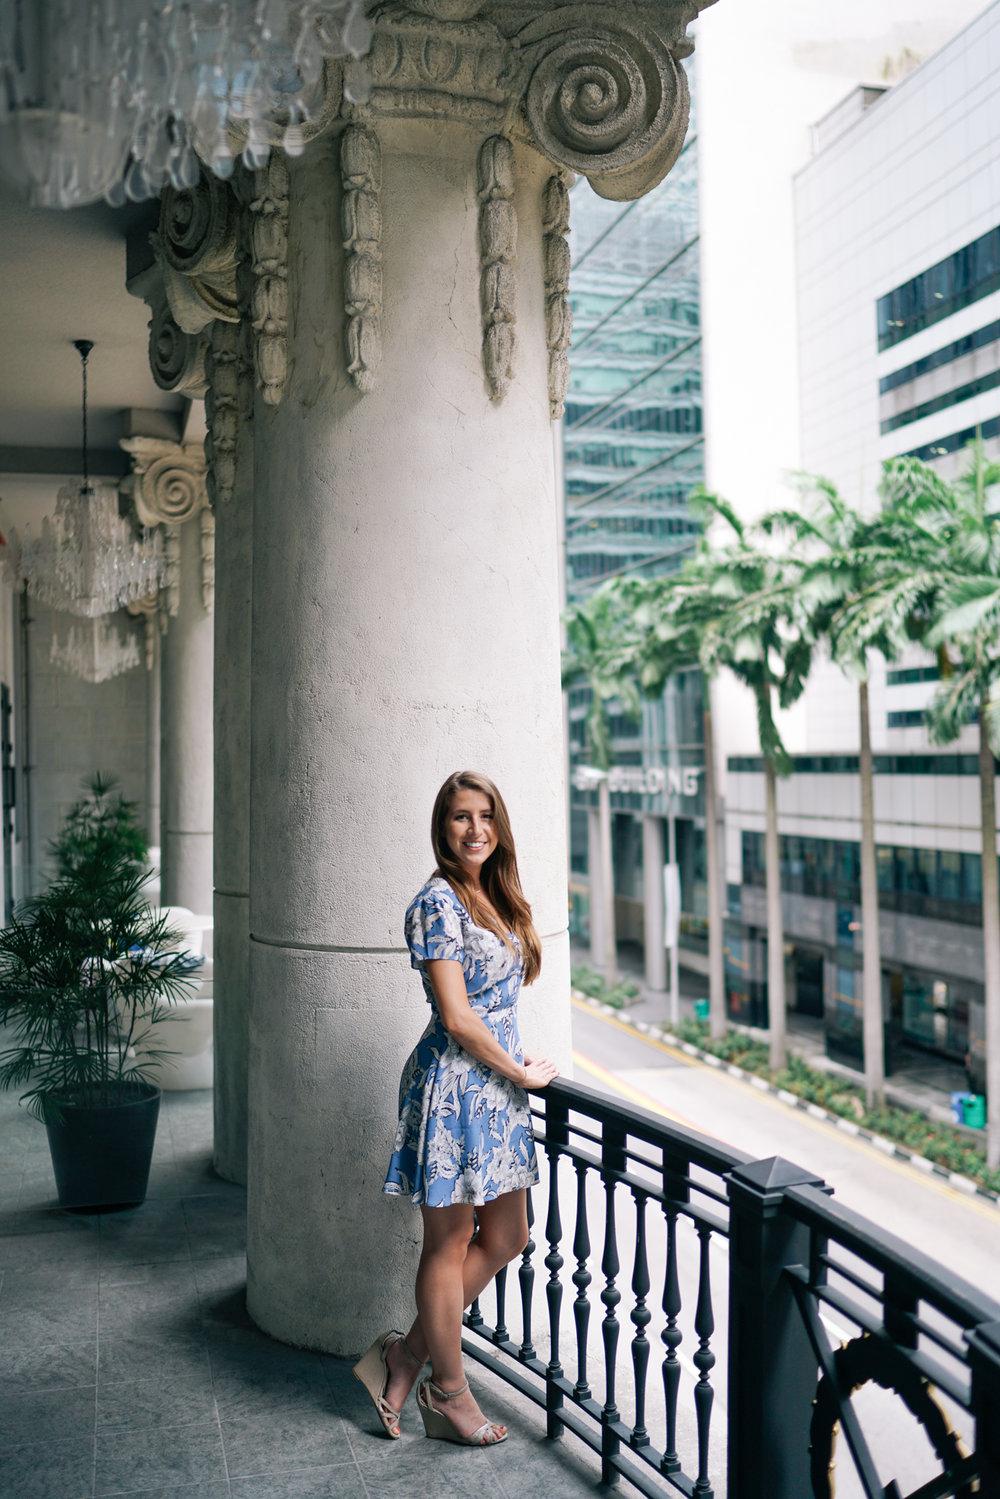 So Sofitel Singapore balcony